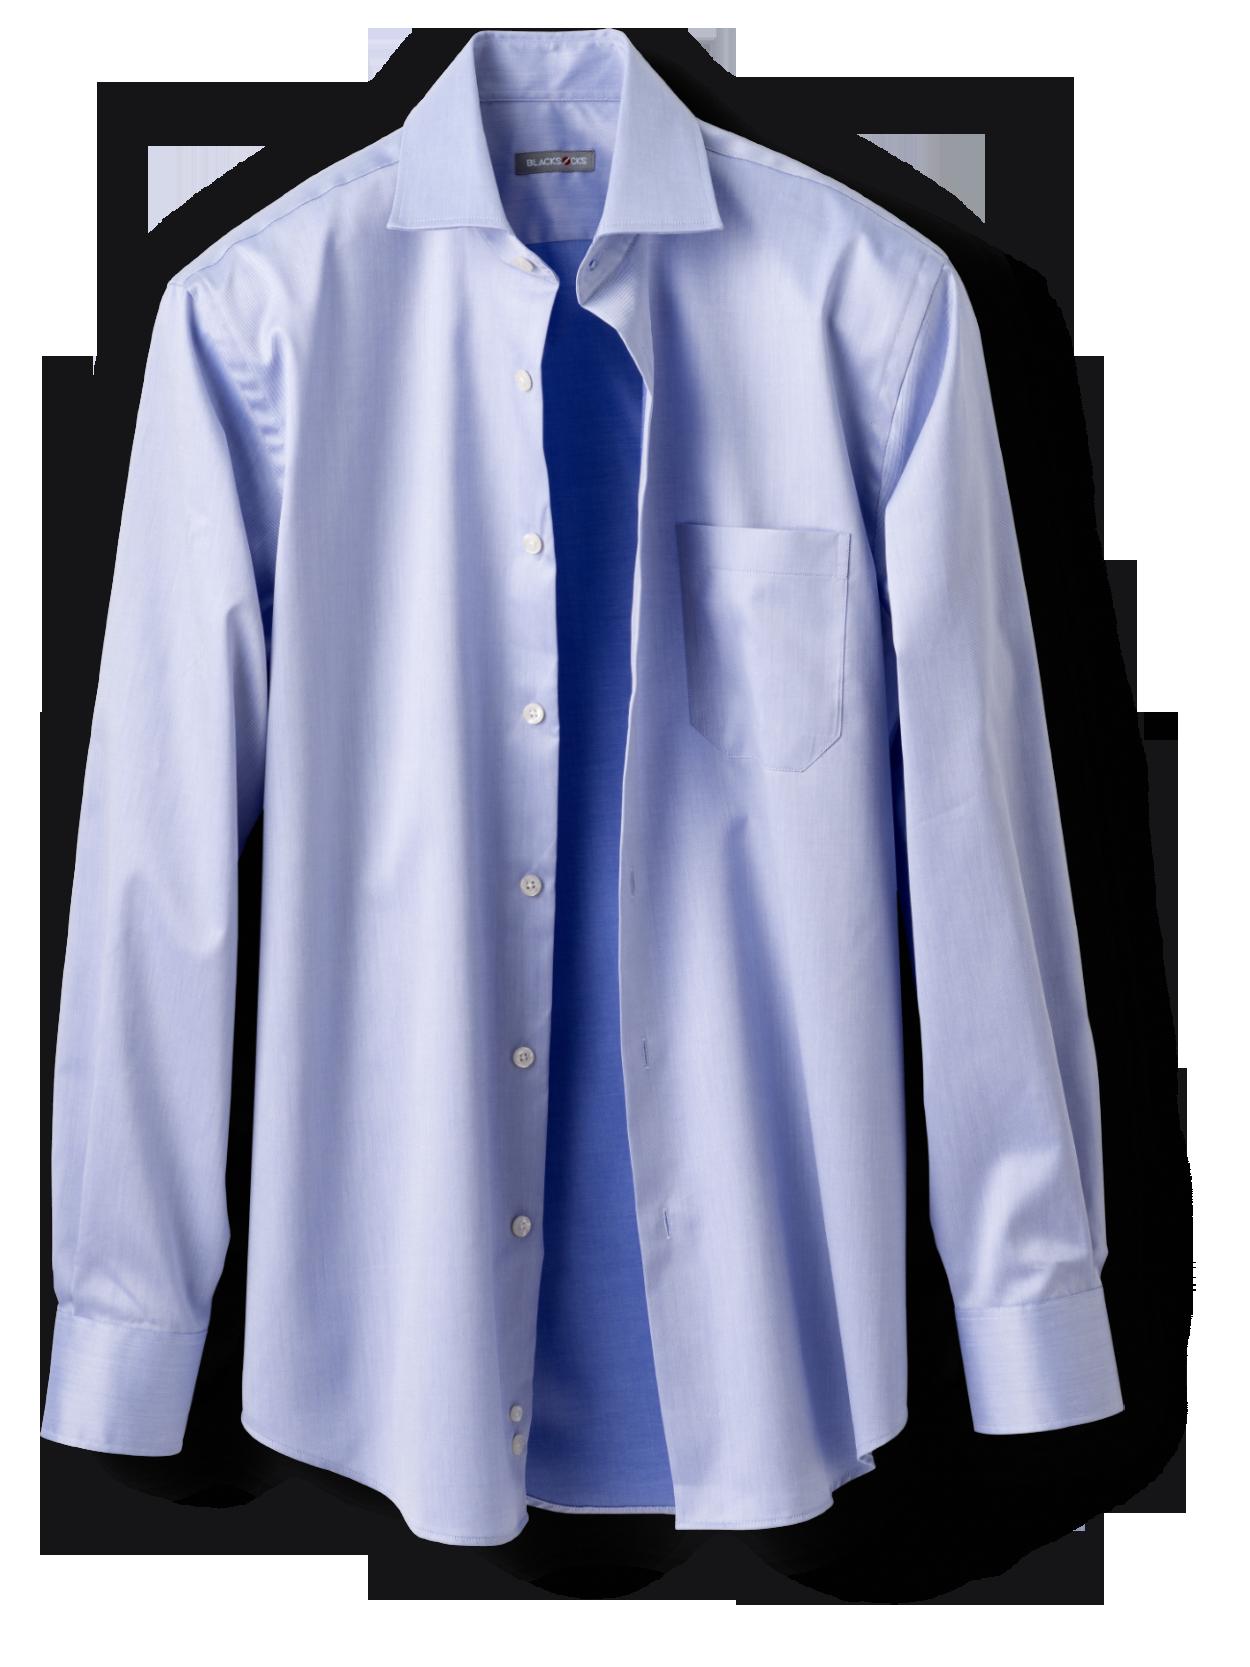 Bastienne Shirt In Blue An Elegant Must Have Blacksocks